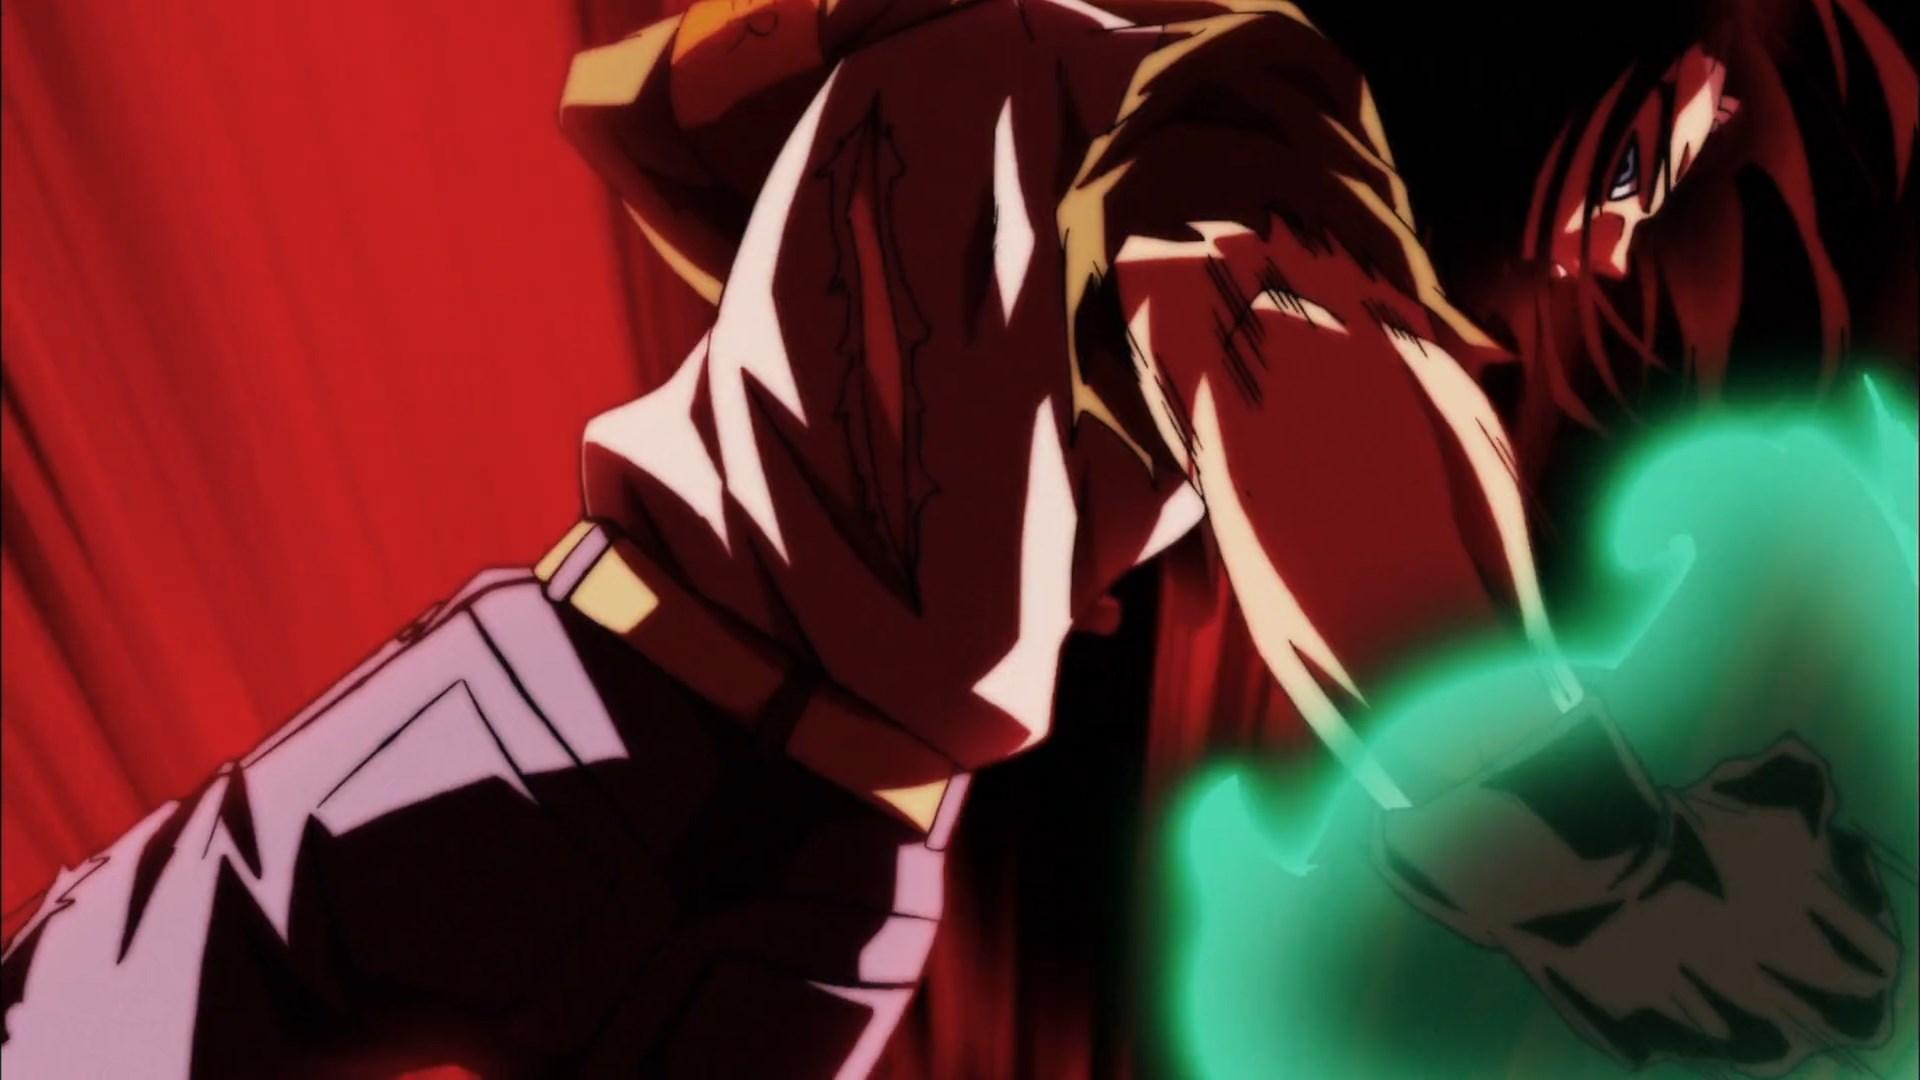 [HorribleSubs] Dragon Ball Super - 121 [1080p].mkv_snapshot_18.38